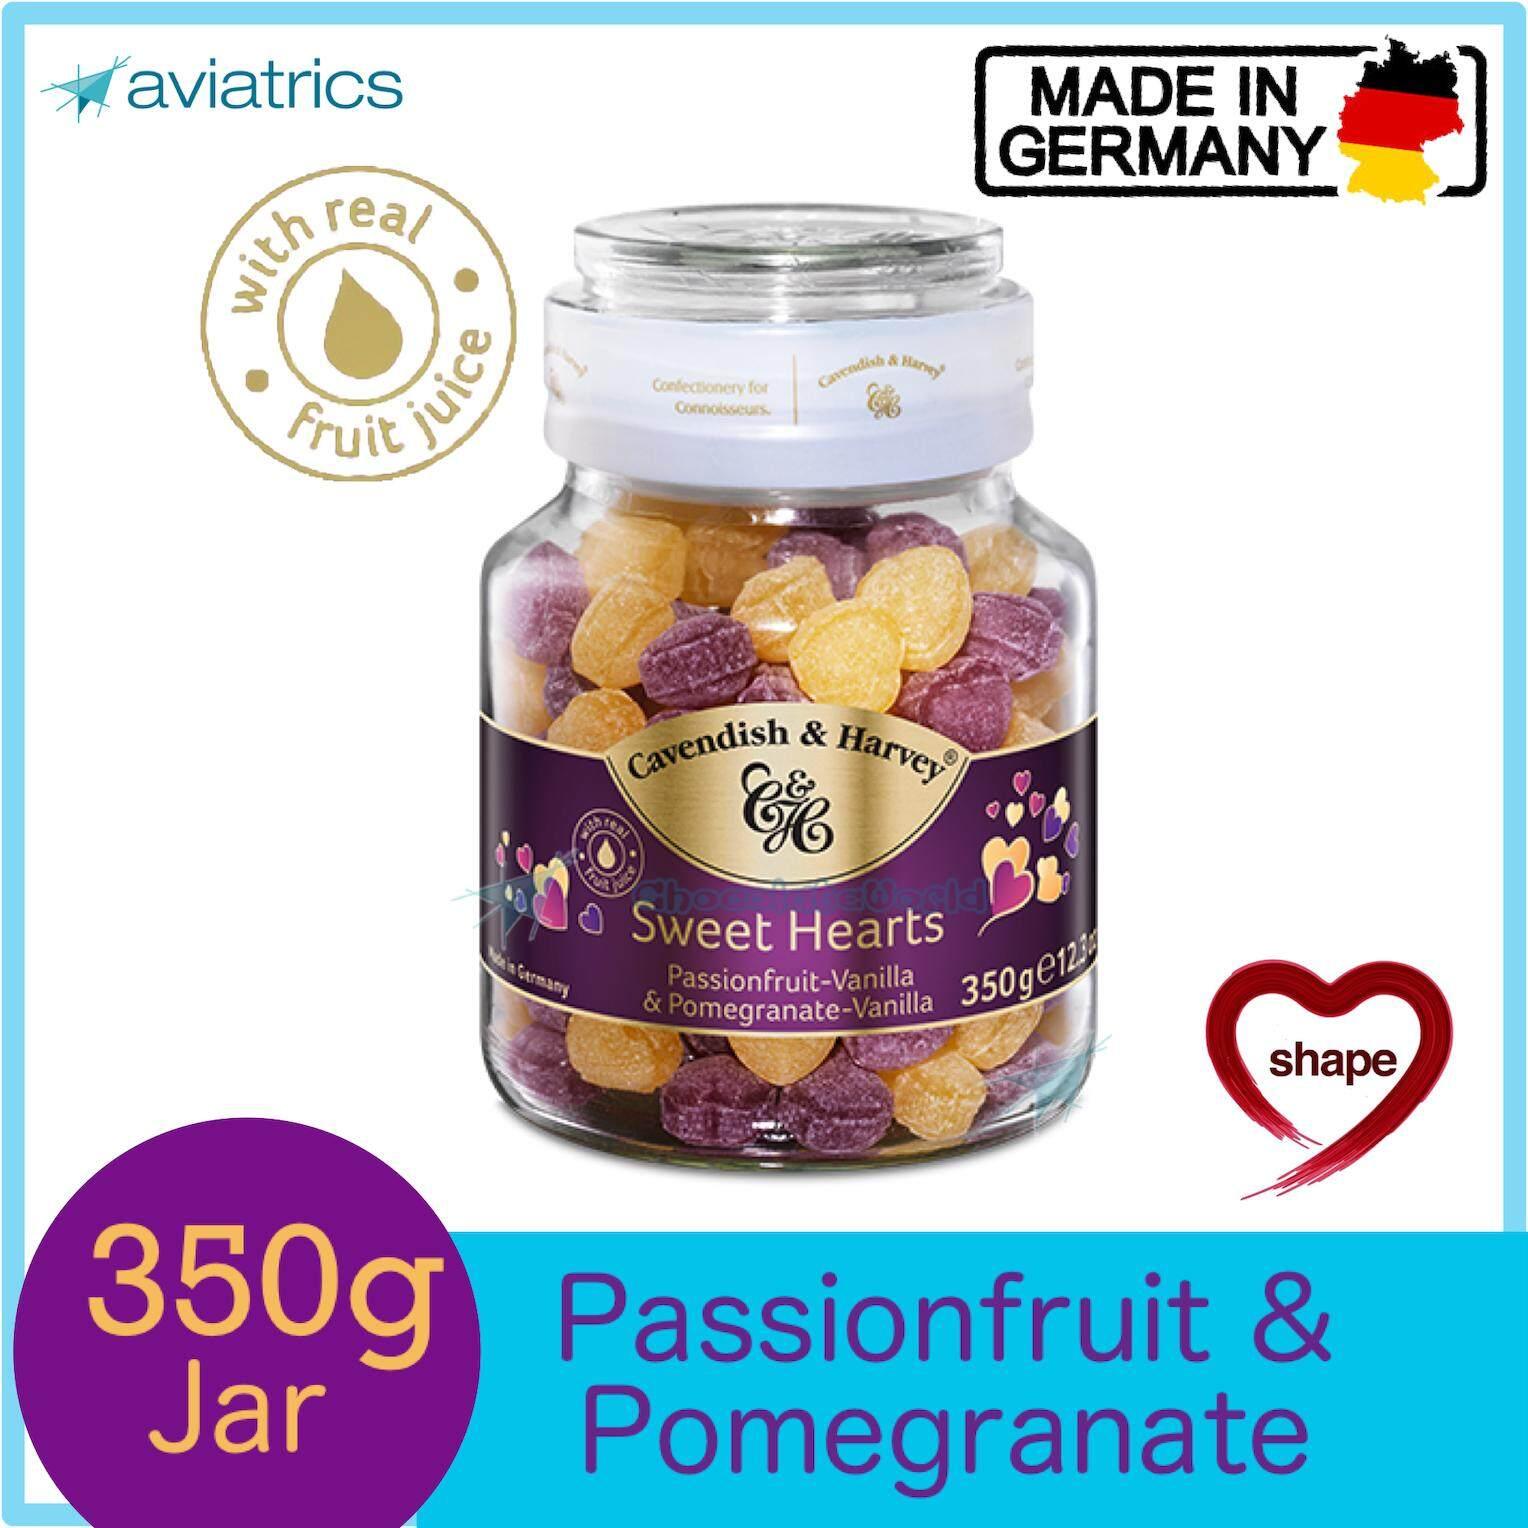 Cavendish Harvey Pasionfruit & Pomegranate Vanilla Heart Shape Drops 350g (Made in Germany)